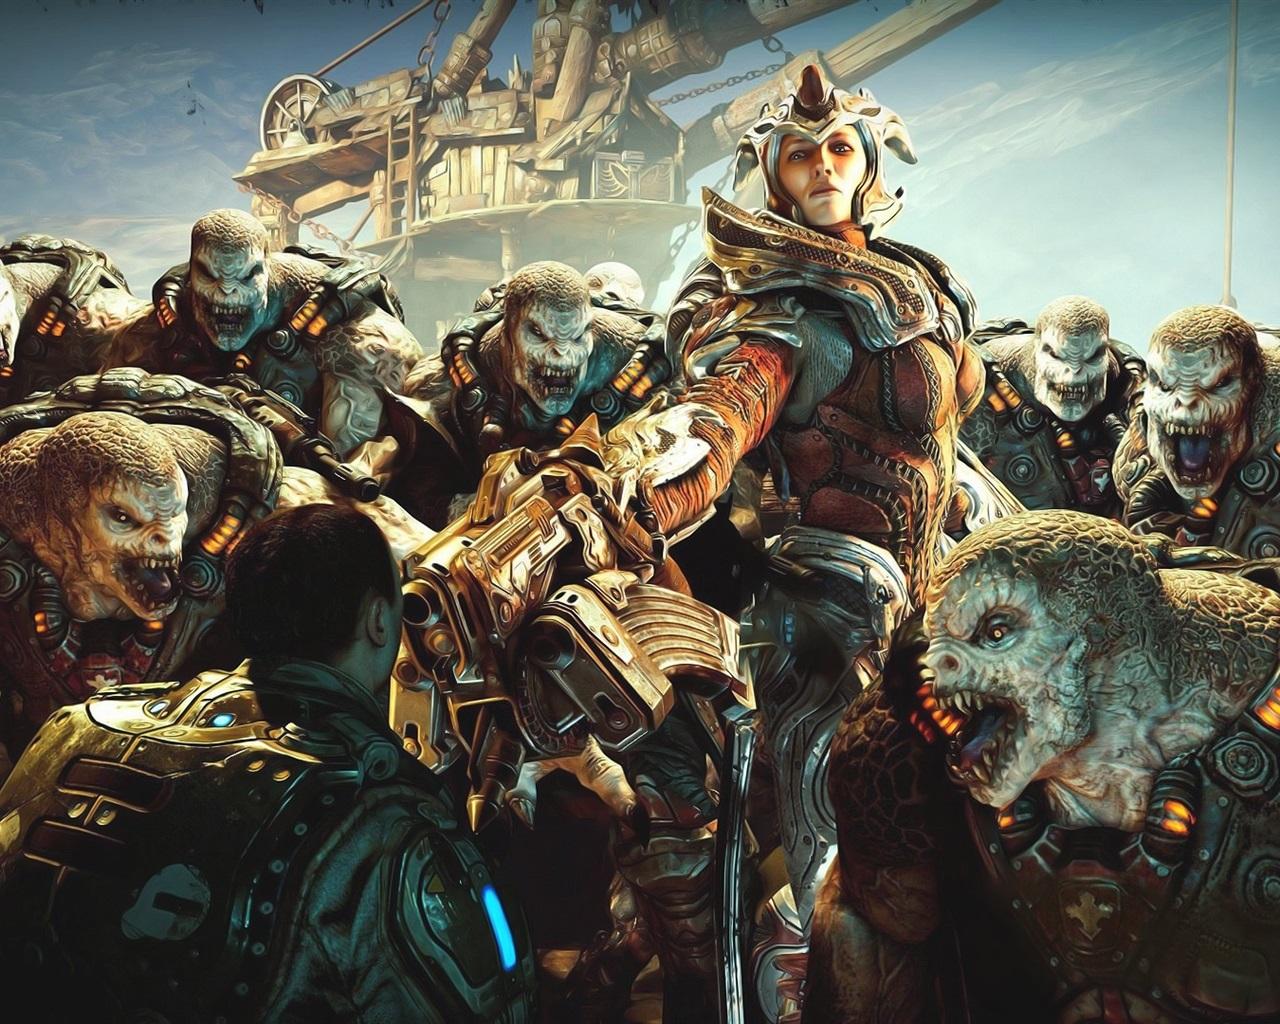 Gears Of War, Girl And Monsters Wallpaper